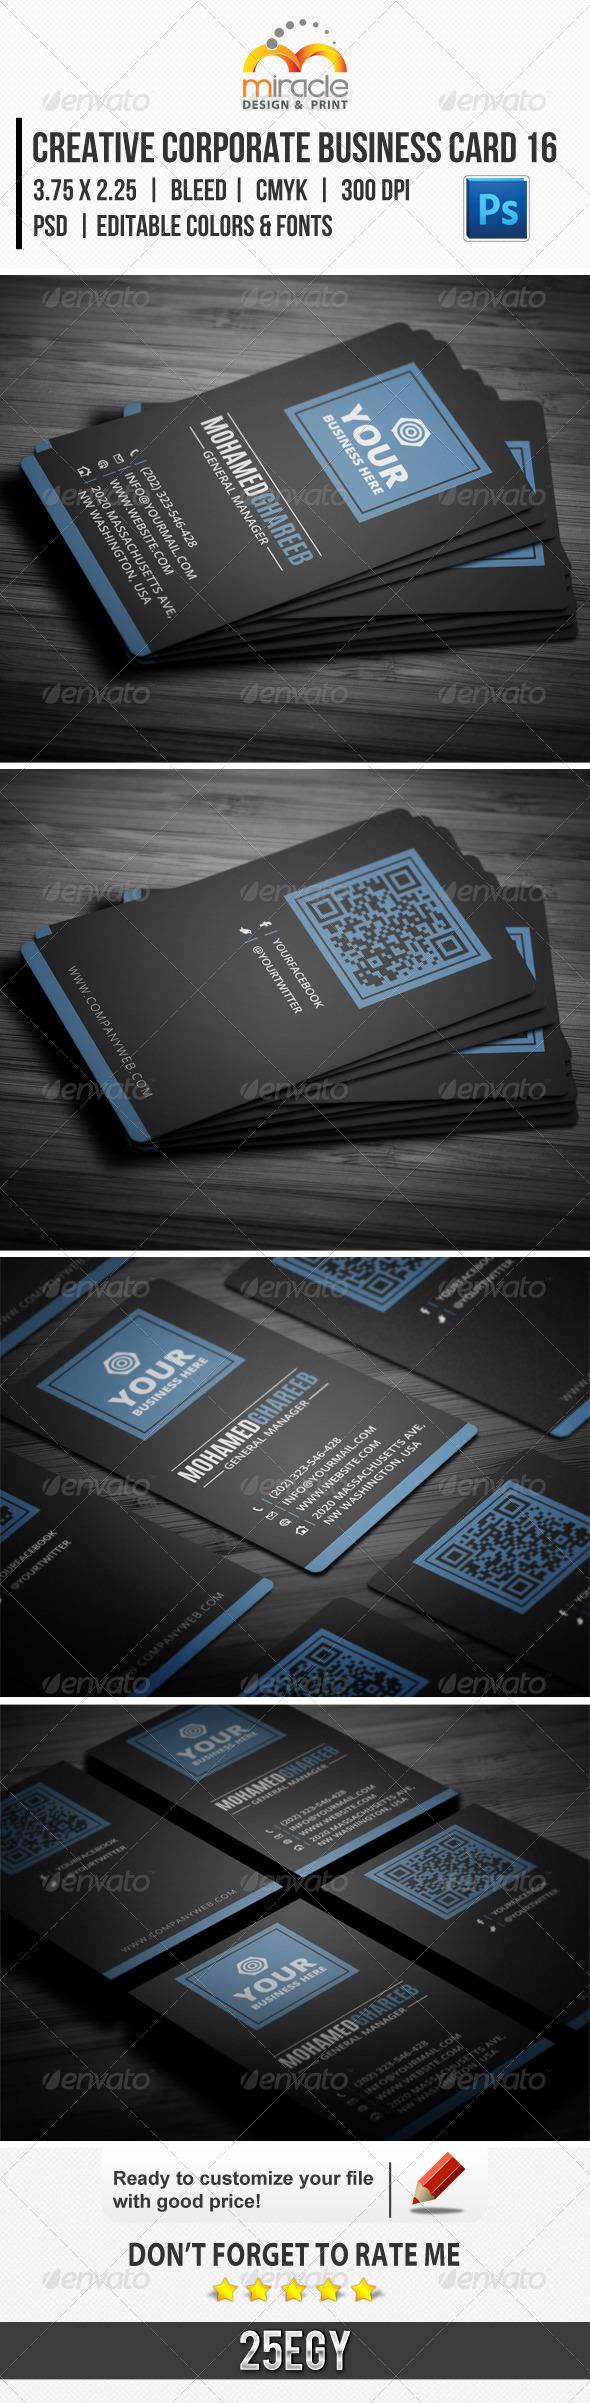 Creative Corporate Business Card 16